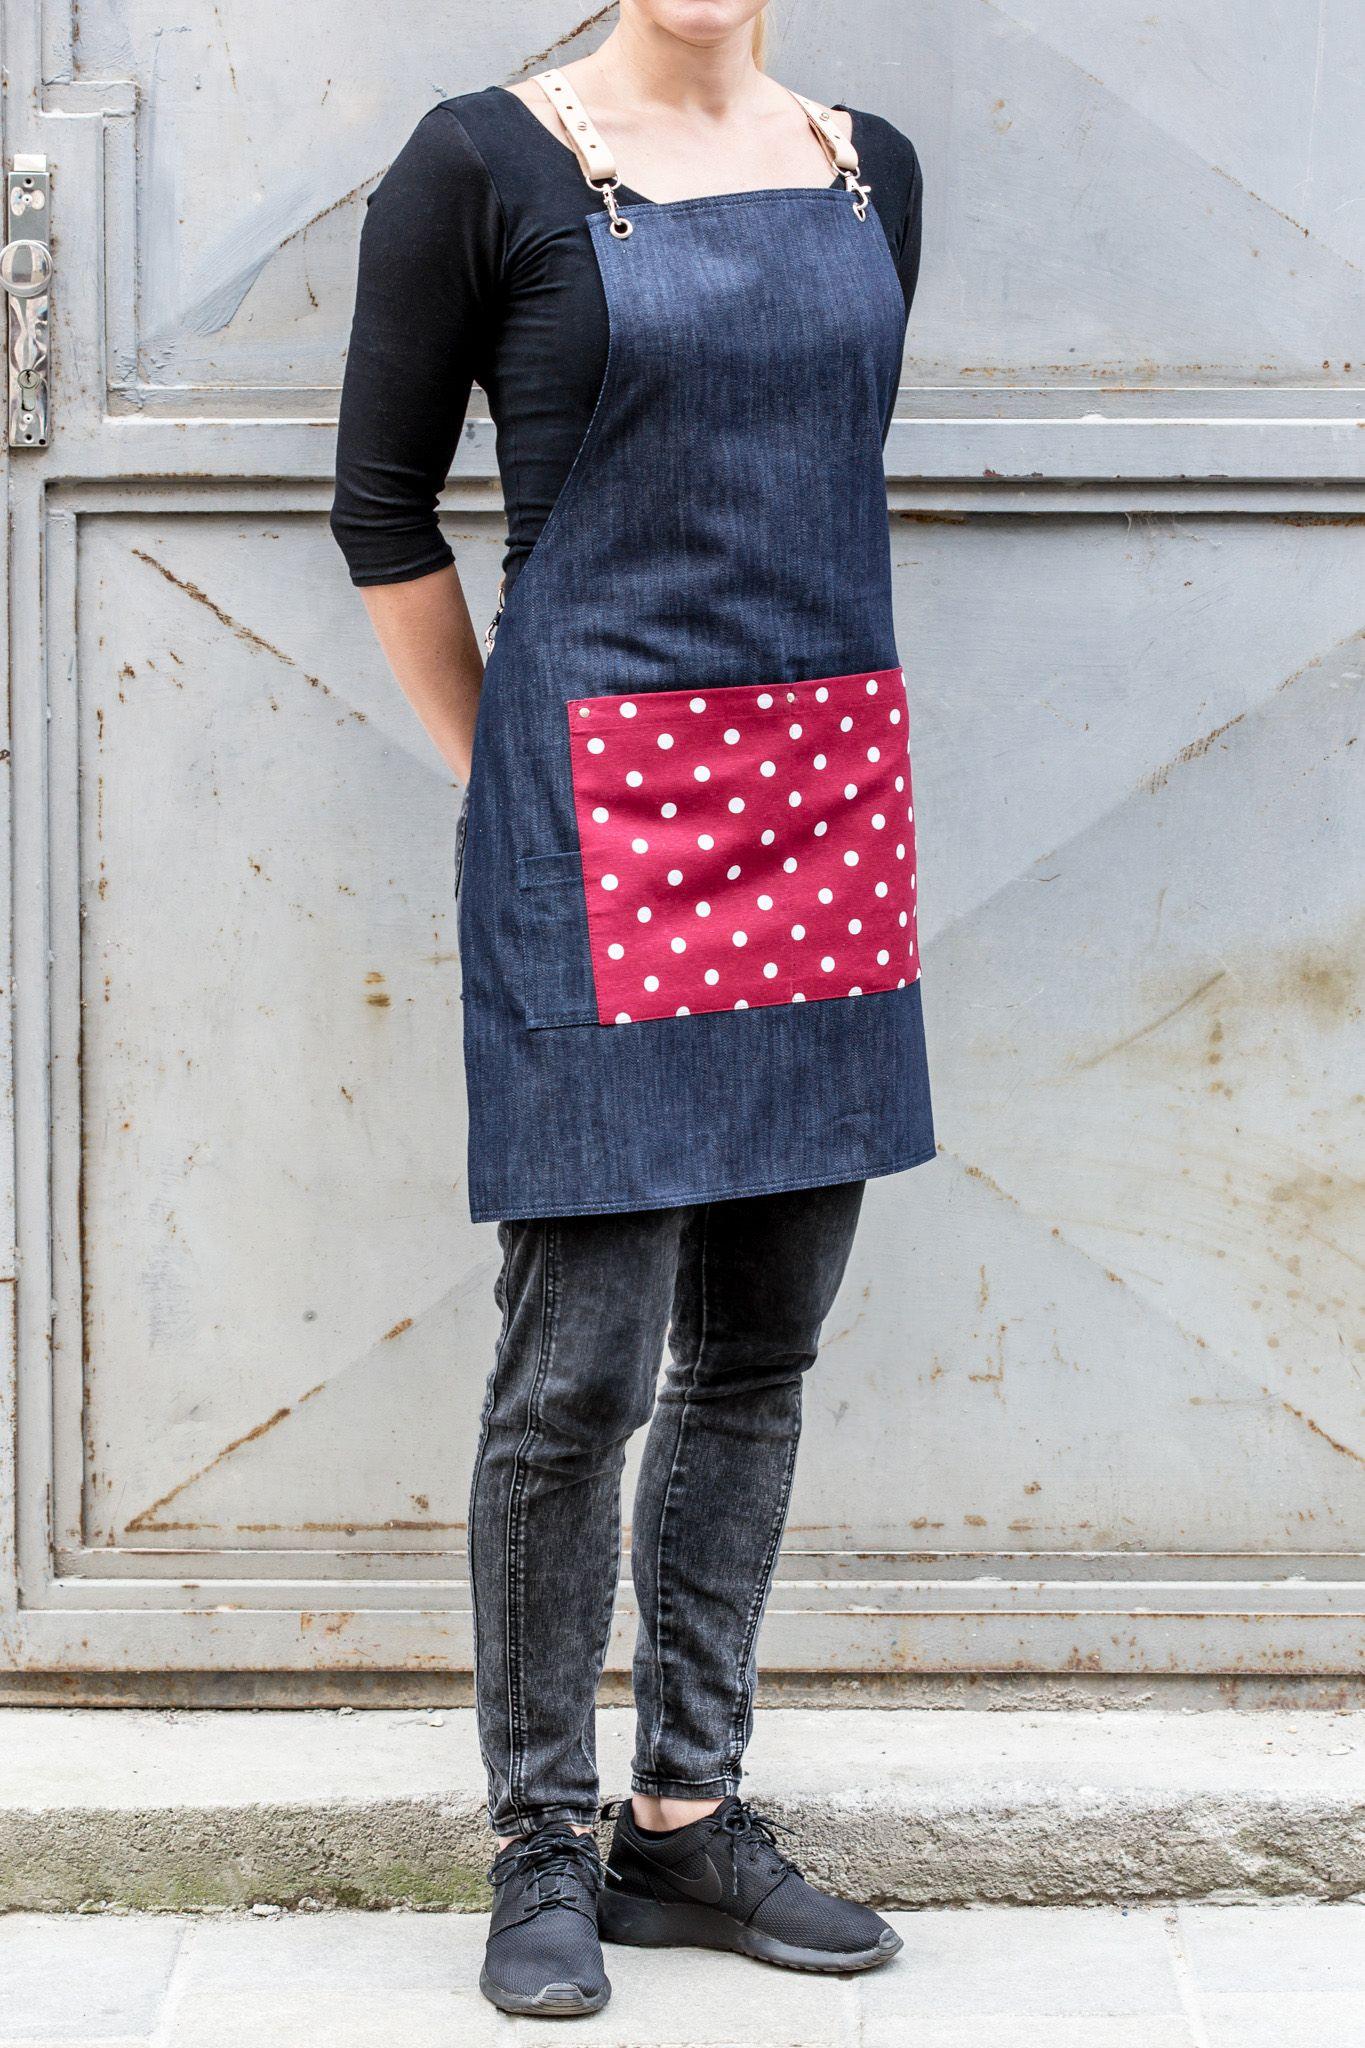 Blue apron omaha - Bartender Denim Apron W Polka Dots Detail Leather Custom Made Straps